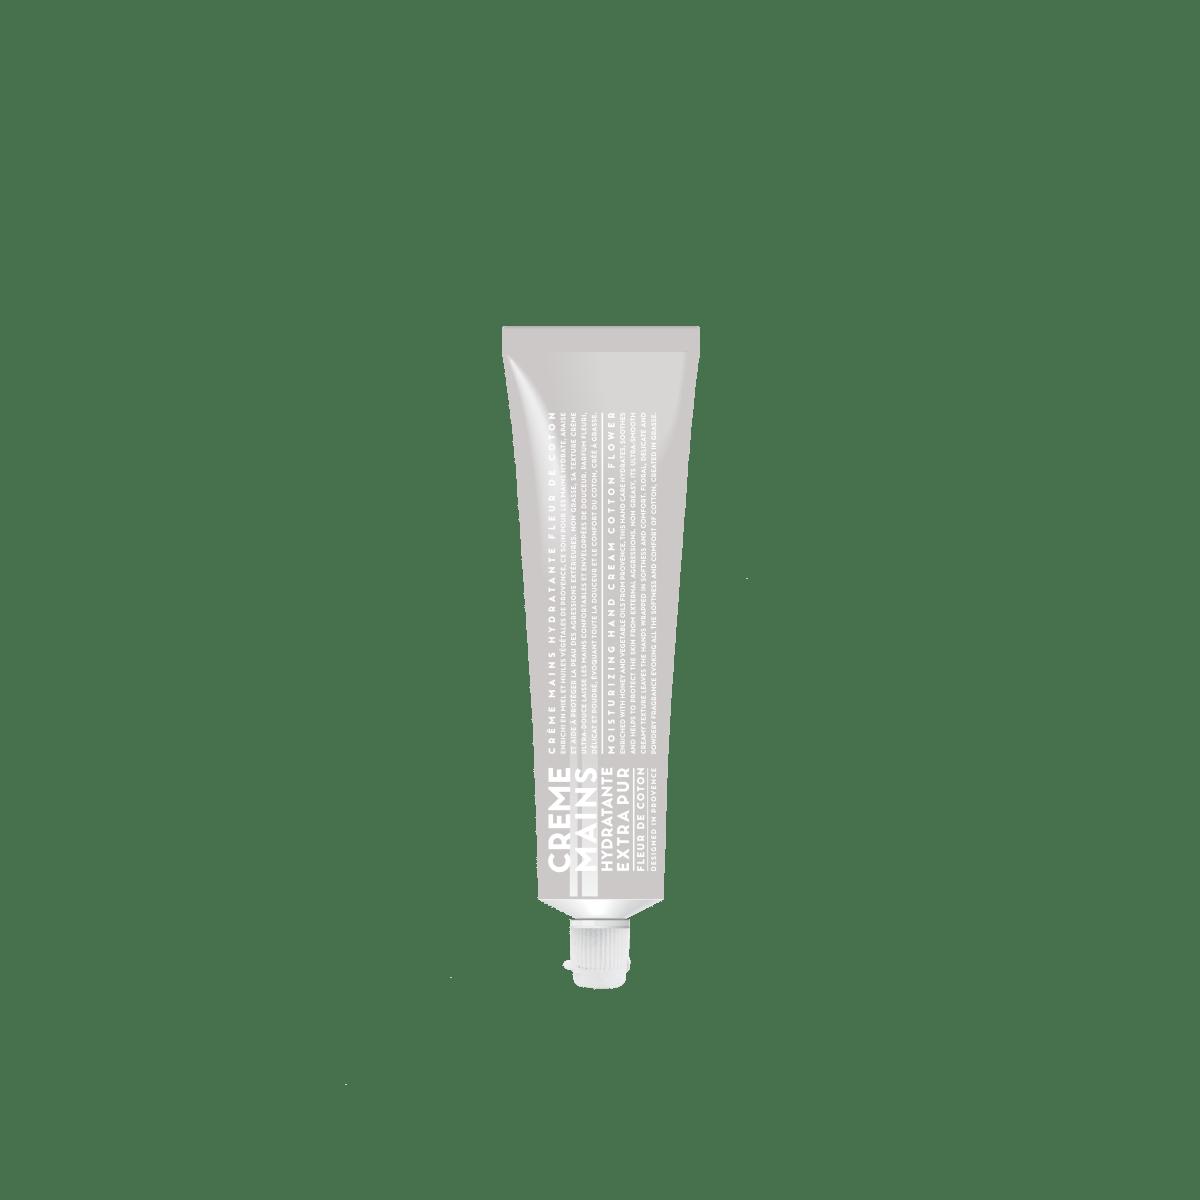 Compagnie de Provence Cotton Flower Hand Cream 100ml